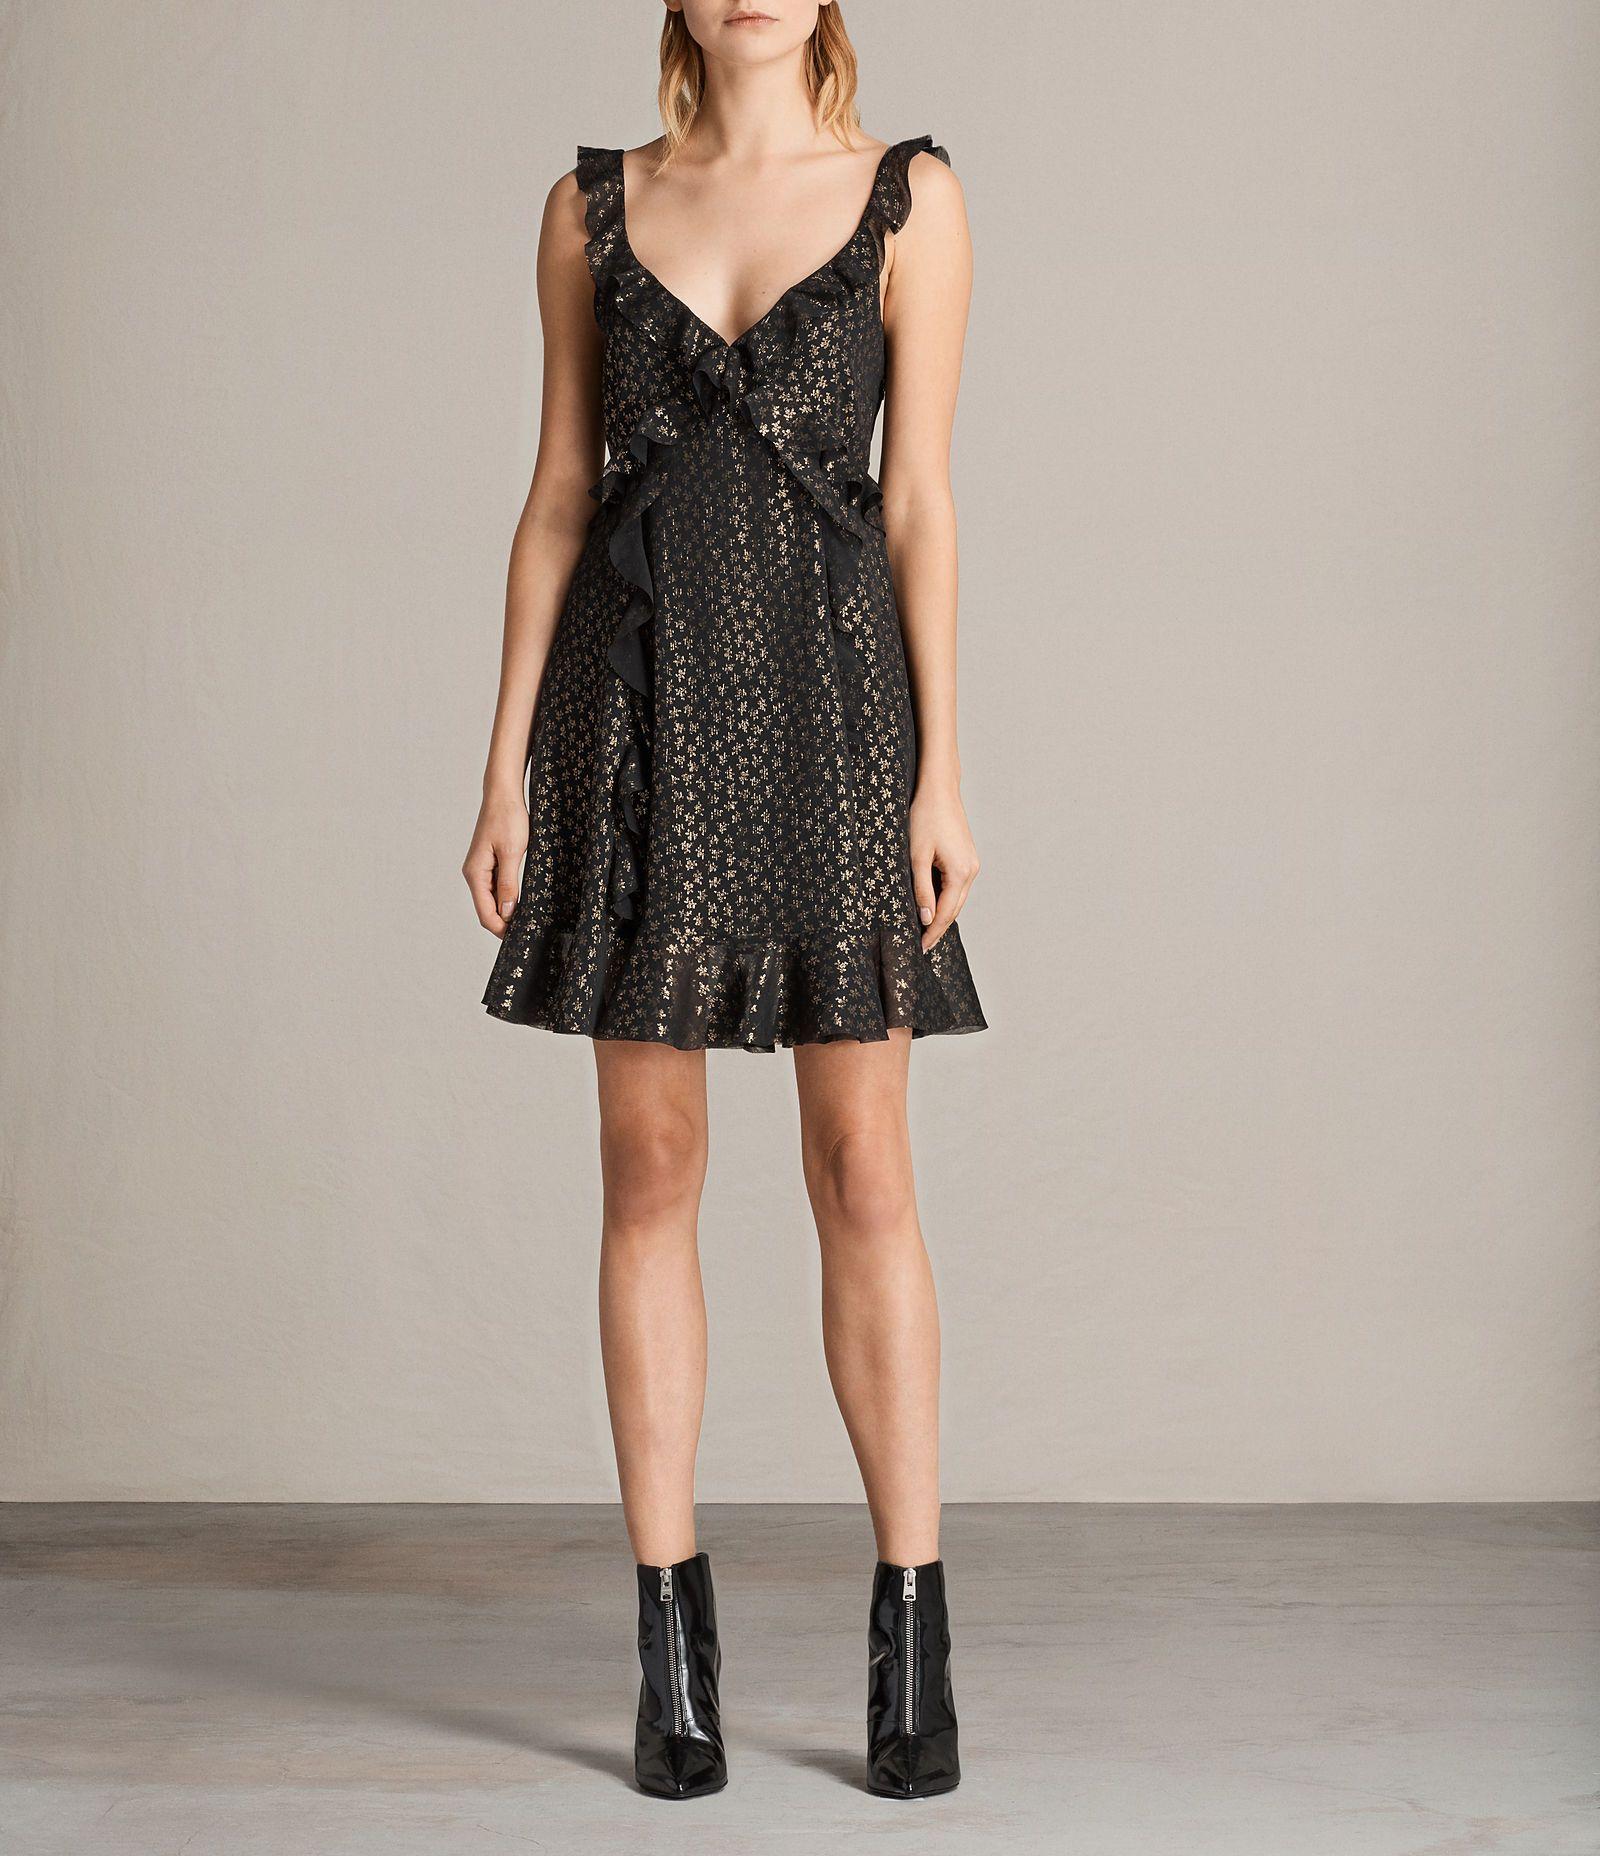 3fa45602929f ALLSAINTS UK: Womens Darell Ruffle Dress (BLACK/GOLD) | šití - šaty ...